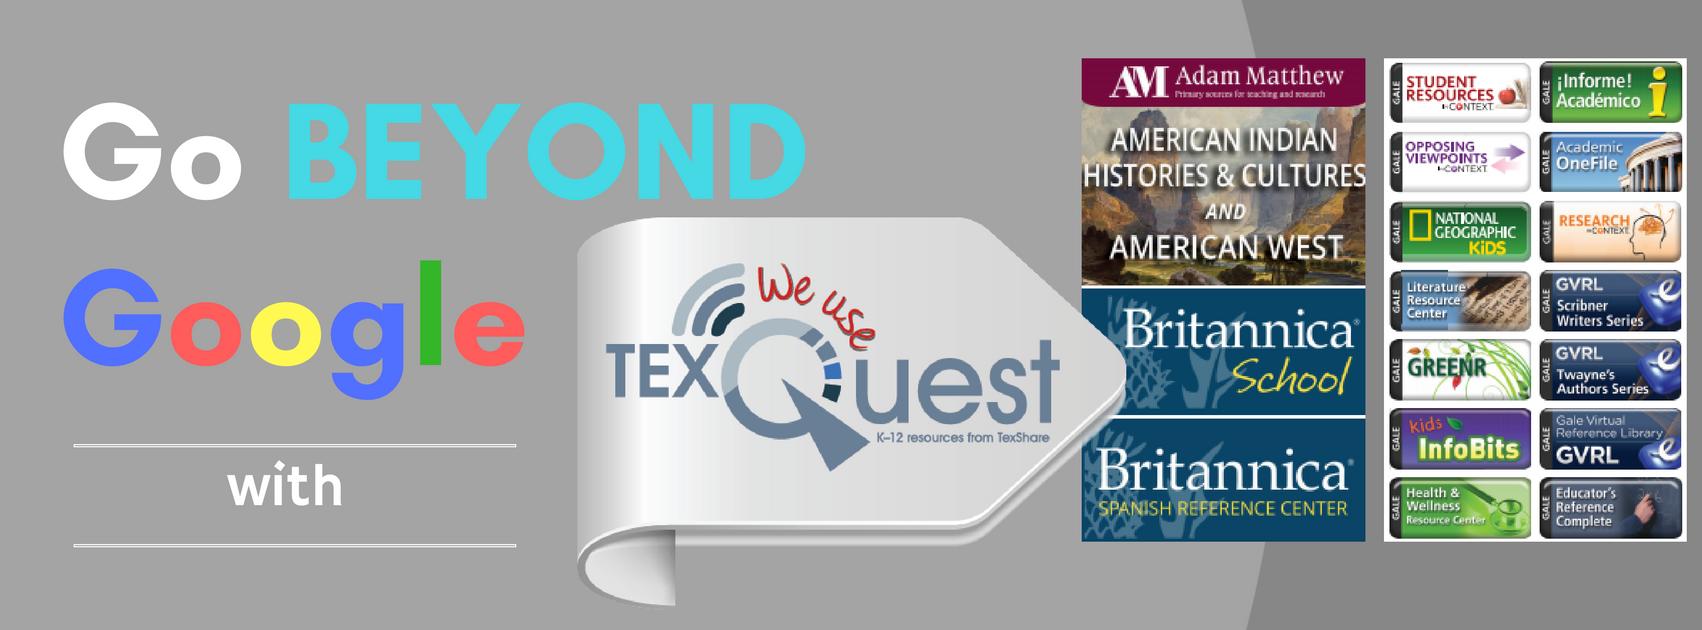 TexQuest banner